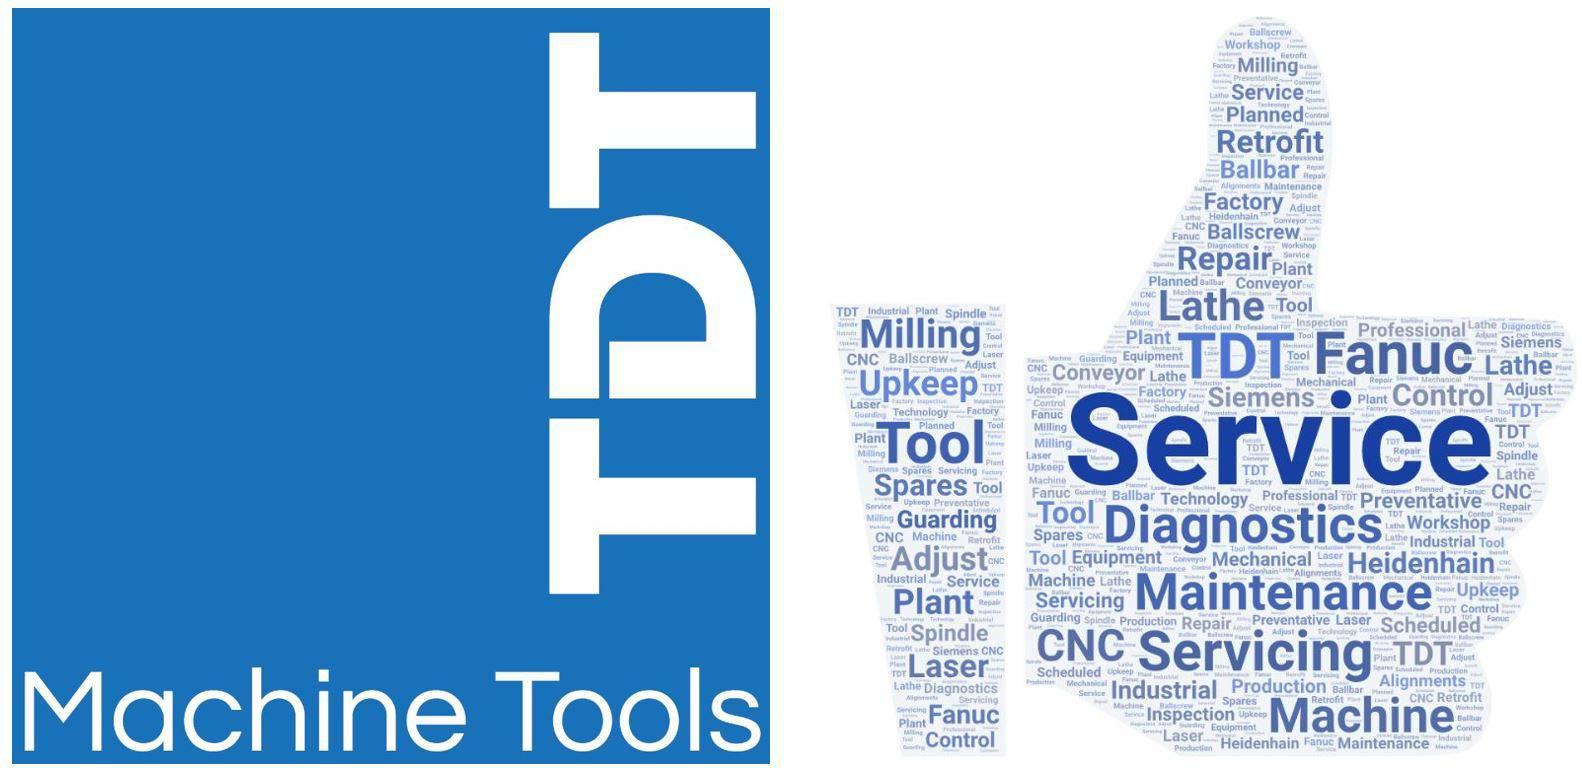 TDT CNC Machine Tool Services